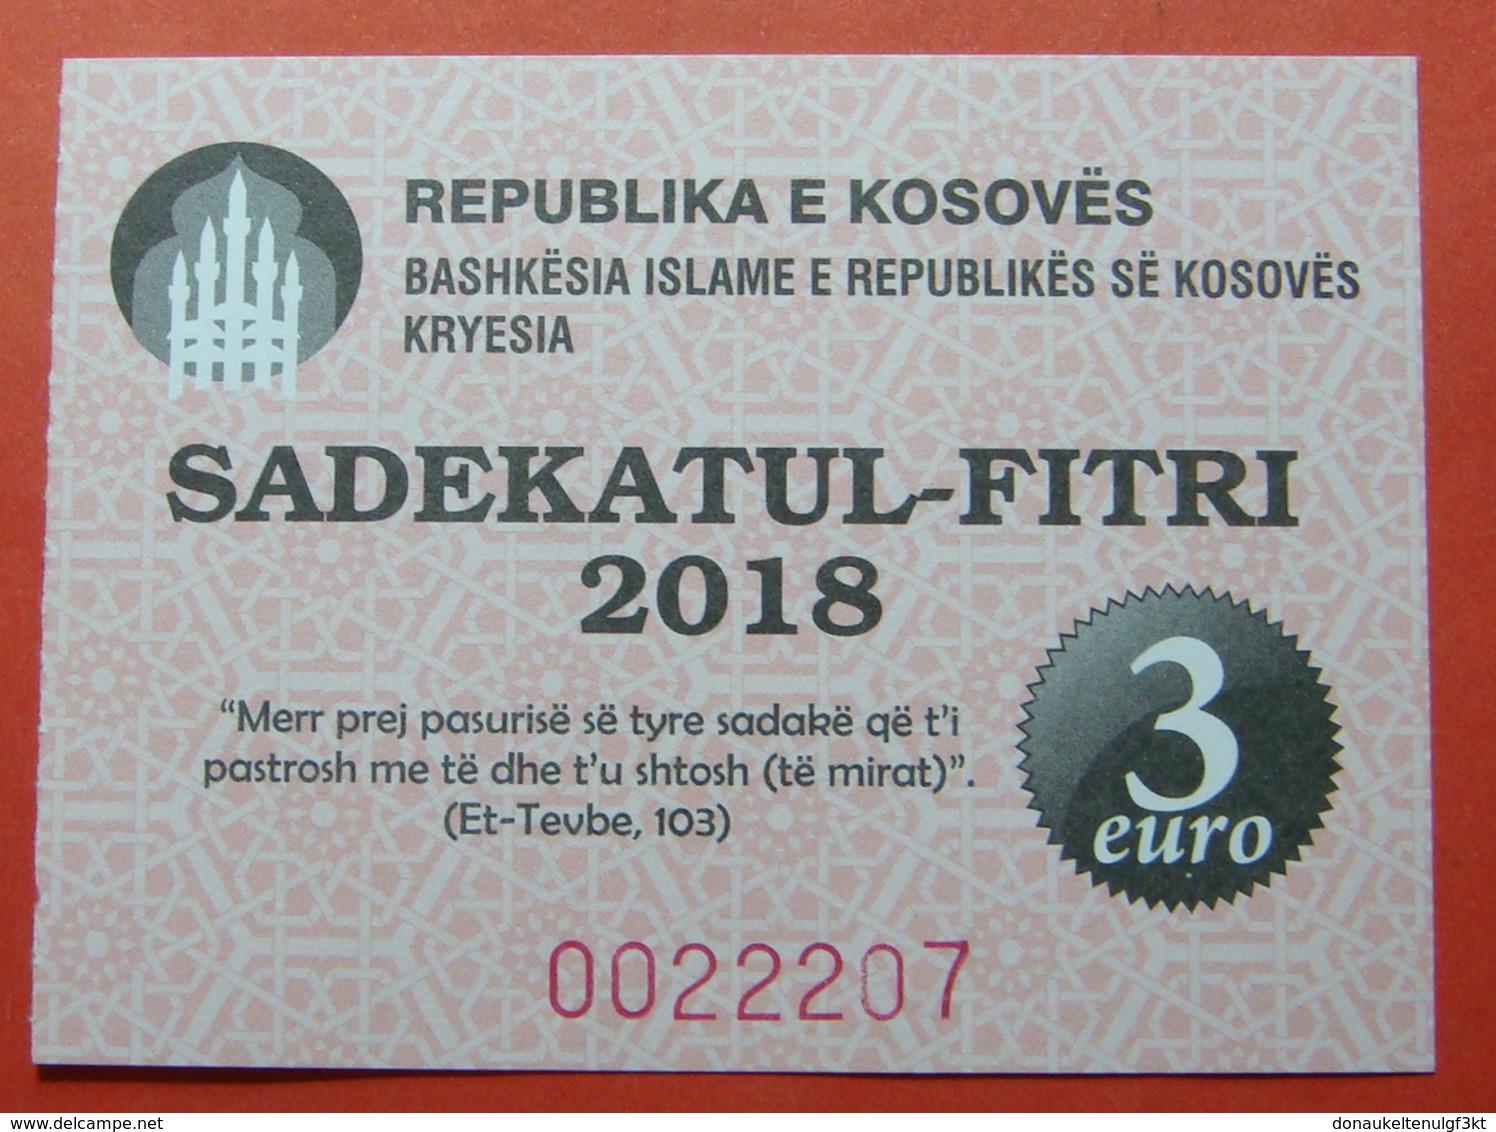 US PROTECTORATE, ISLAMIC STATE OF KOSOVO, 3 EURO 2018 SADAKA RAMADAN BON - Etats-Unis